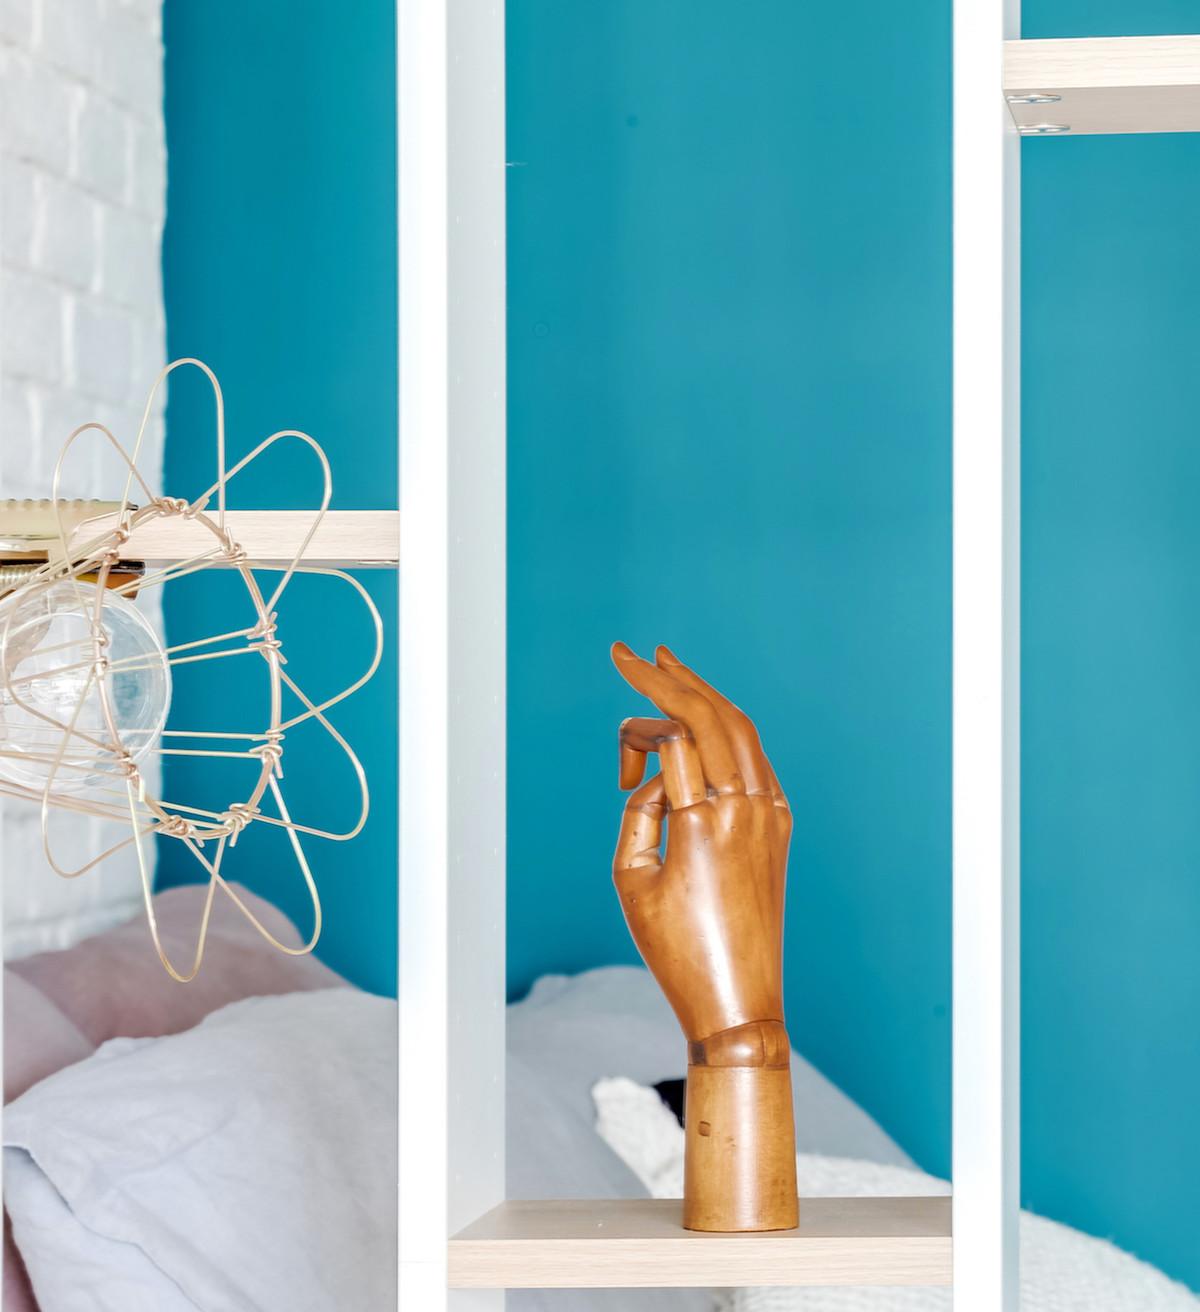 clemaroundthecorner cloison astucieuse bibliothèque moderne mur turquoise astuce optimisation espace